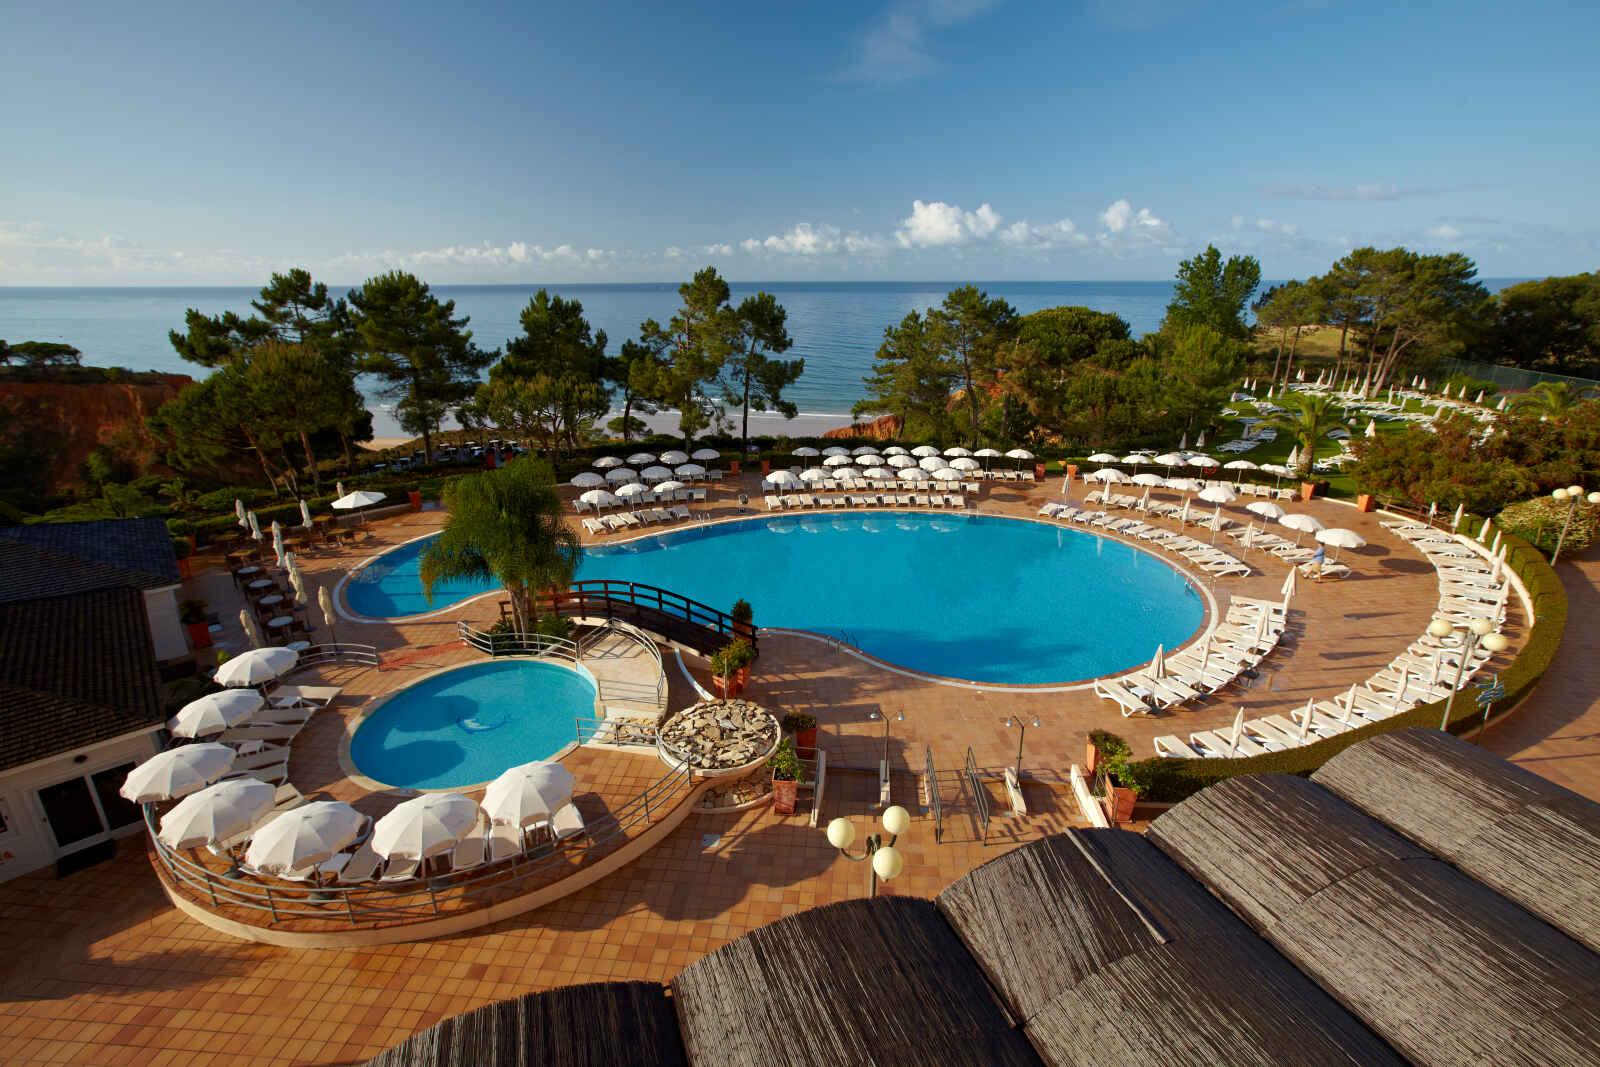 Séjour Algarve - PortoBay Falésia - région d'Albufeira - 4*